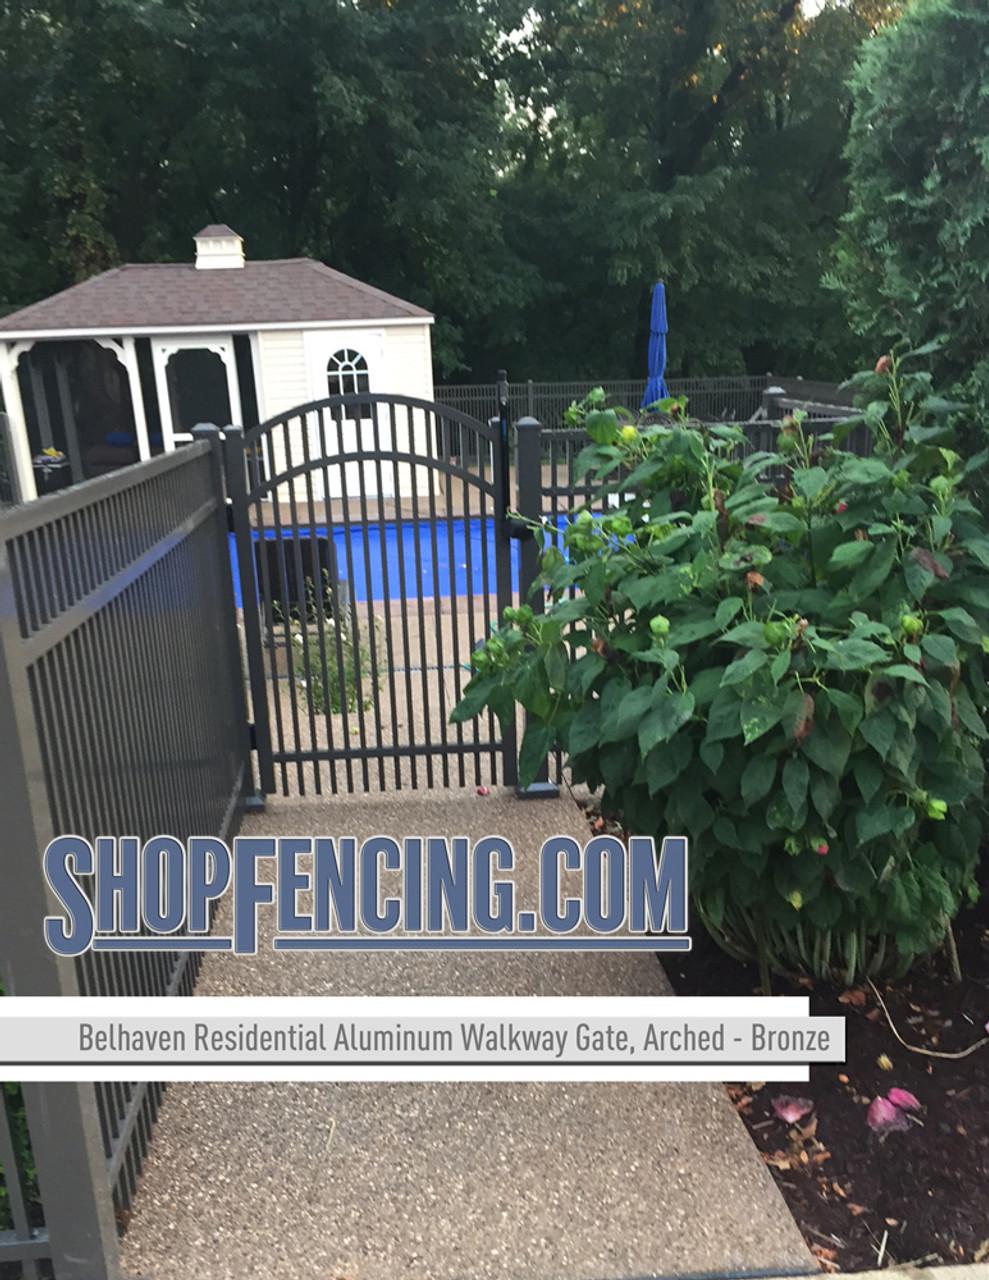 Bronze Residential Belhaven Aluminum Walkway Gate From ShopFencing.com